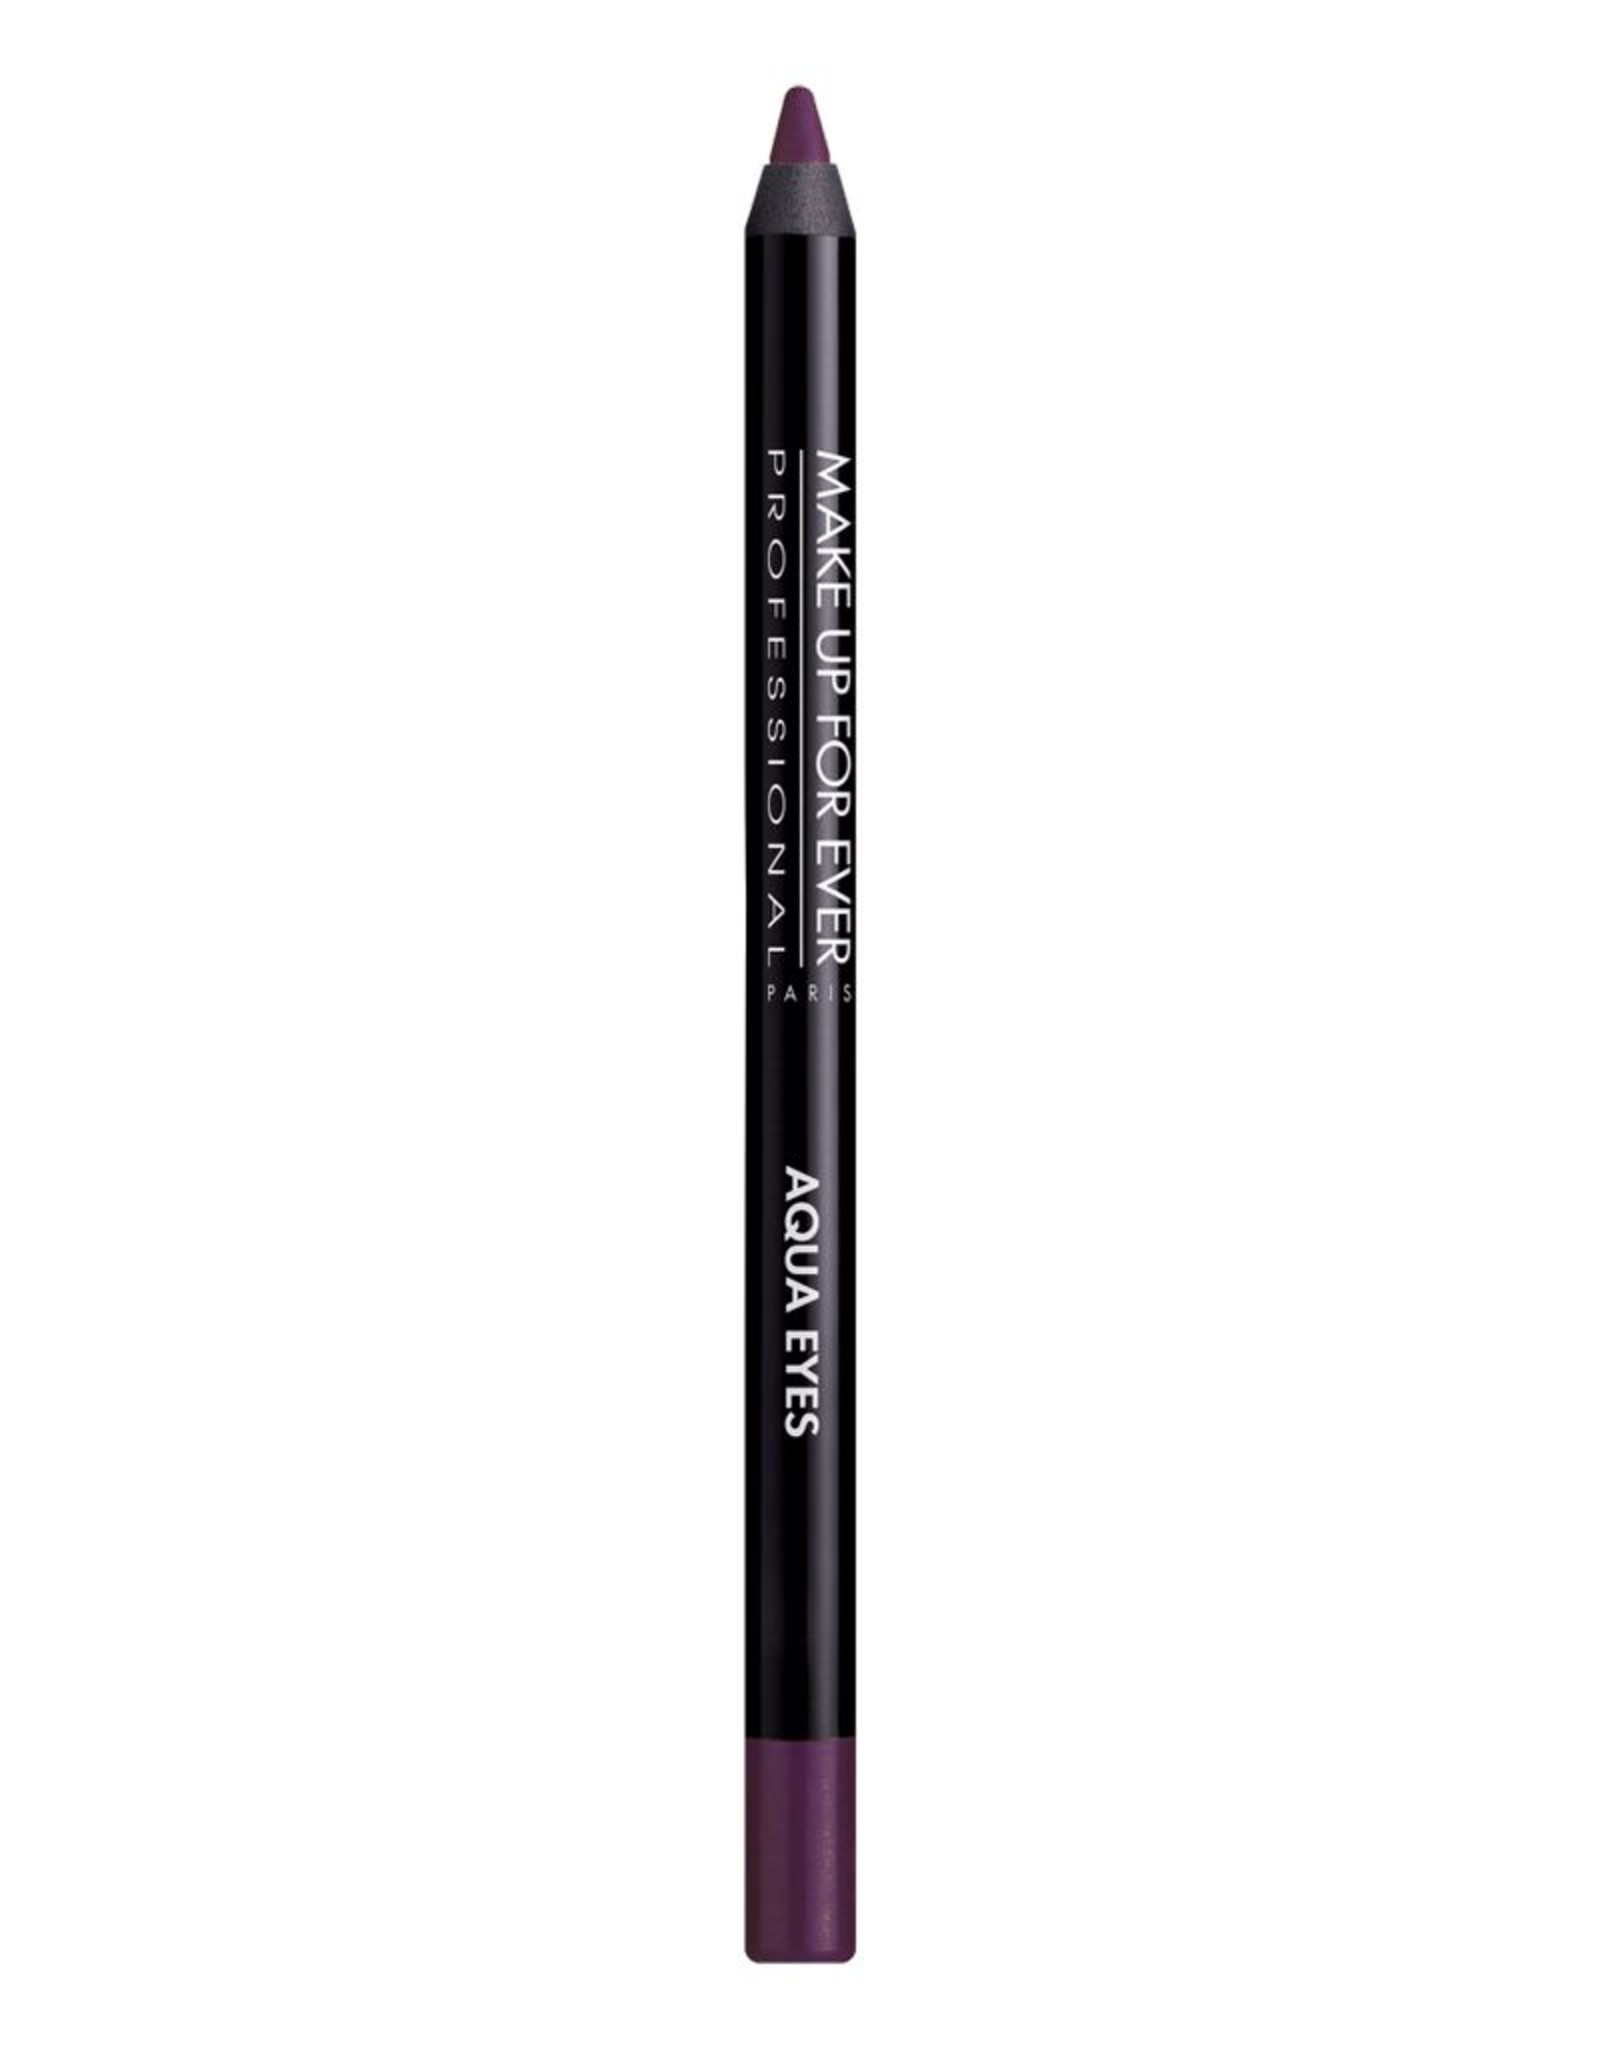 MUFE AQUA EYES CRAYON YEUX WTP NACRE 1,2g 6L noir reflets violets